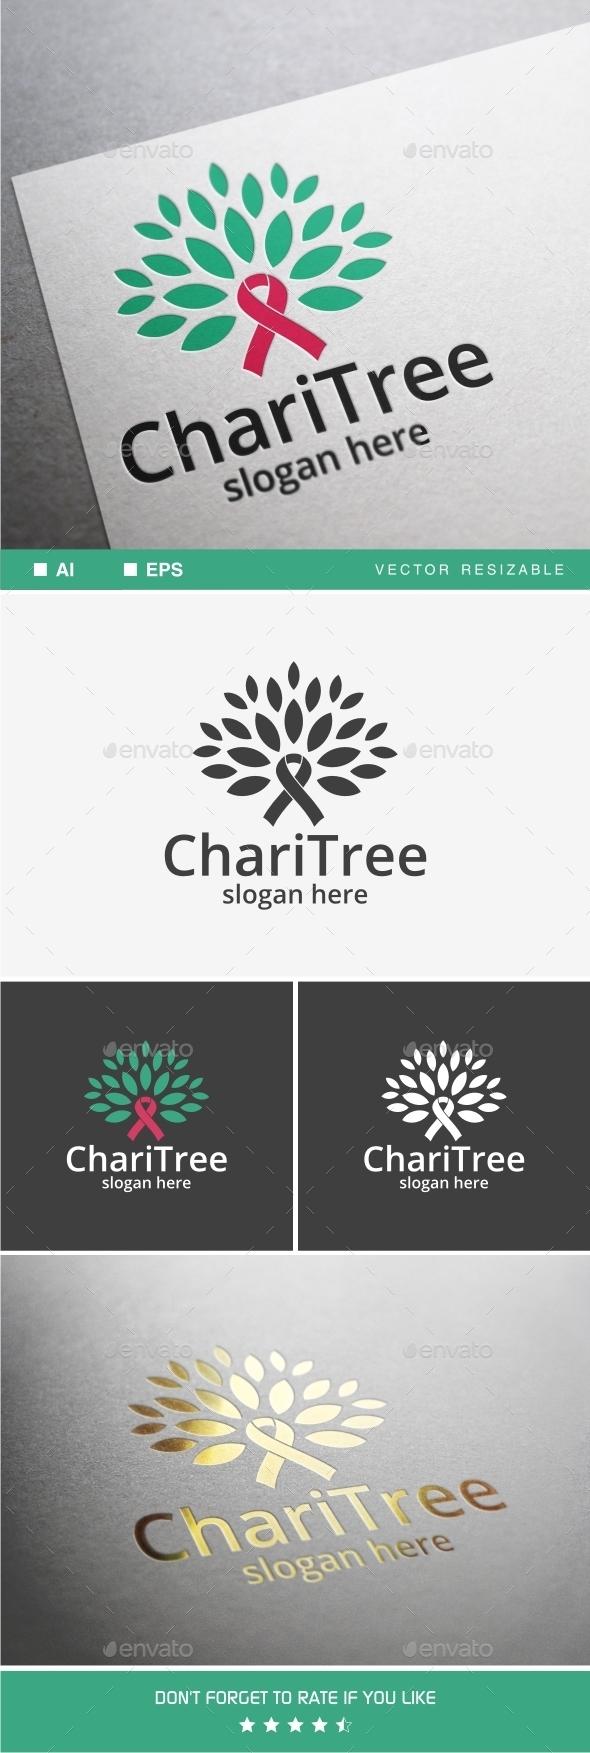 GraphicRiver Charitree Logo 9789839